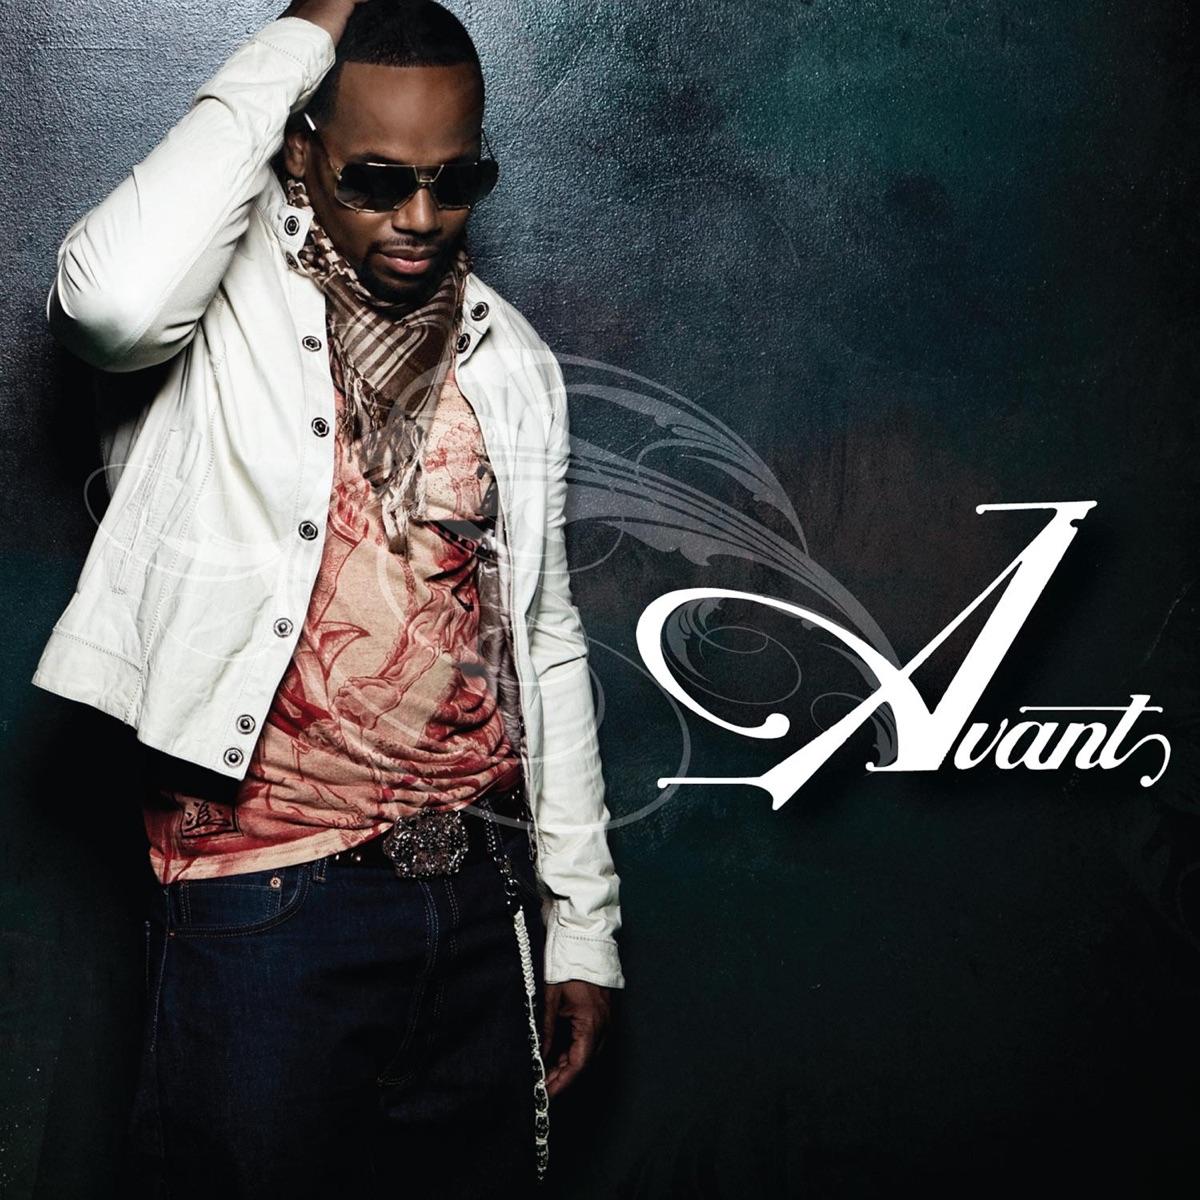 Avant Album Cover by Avant